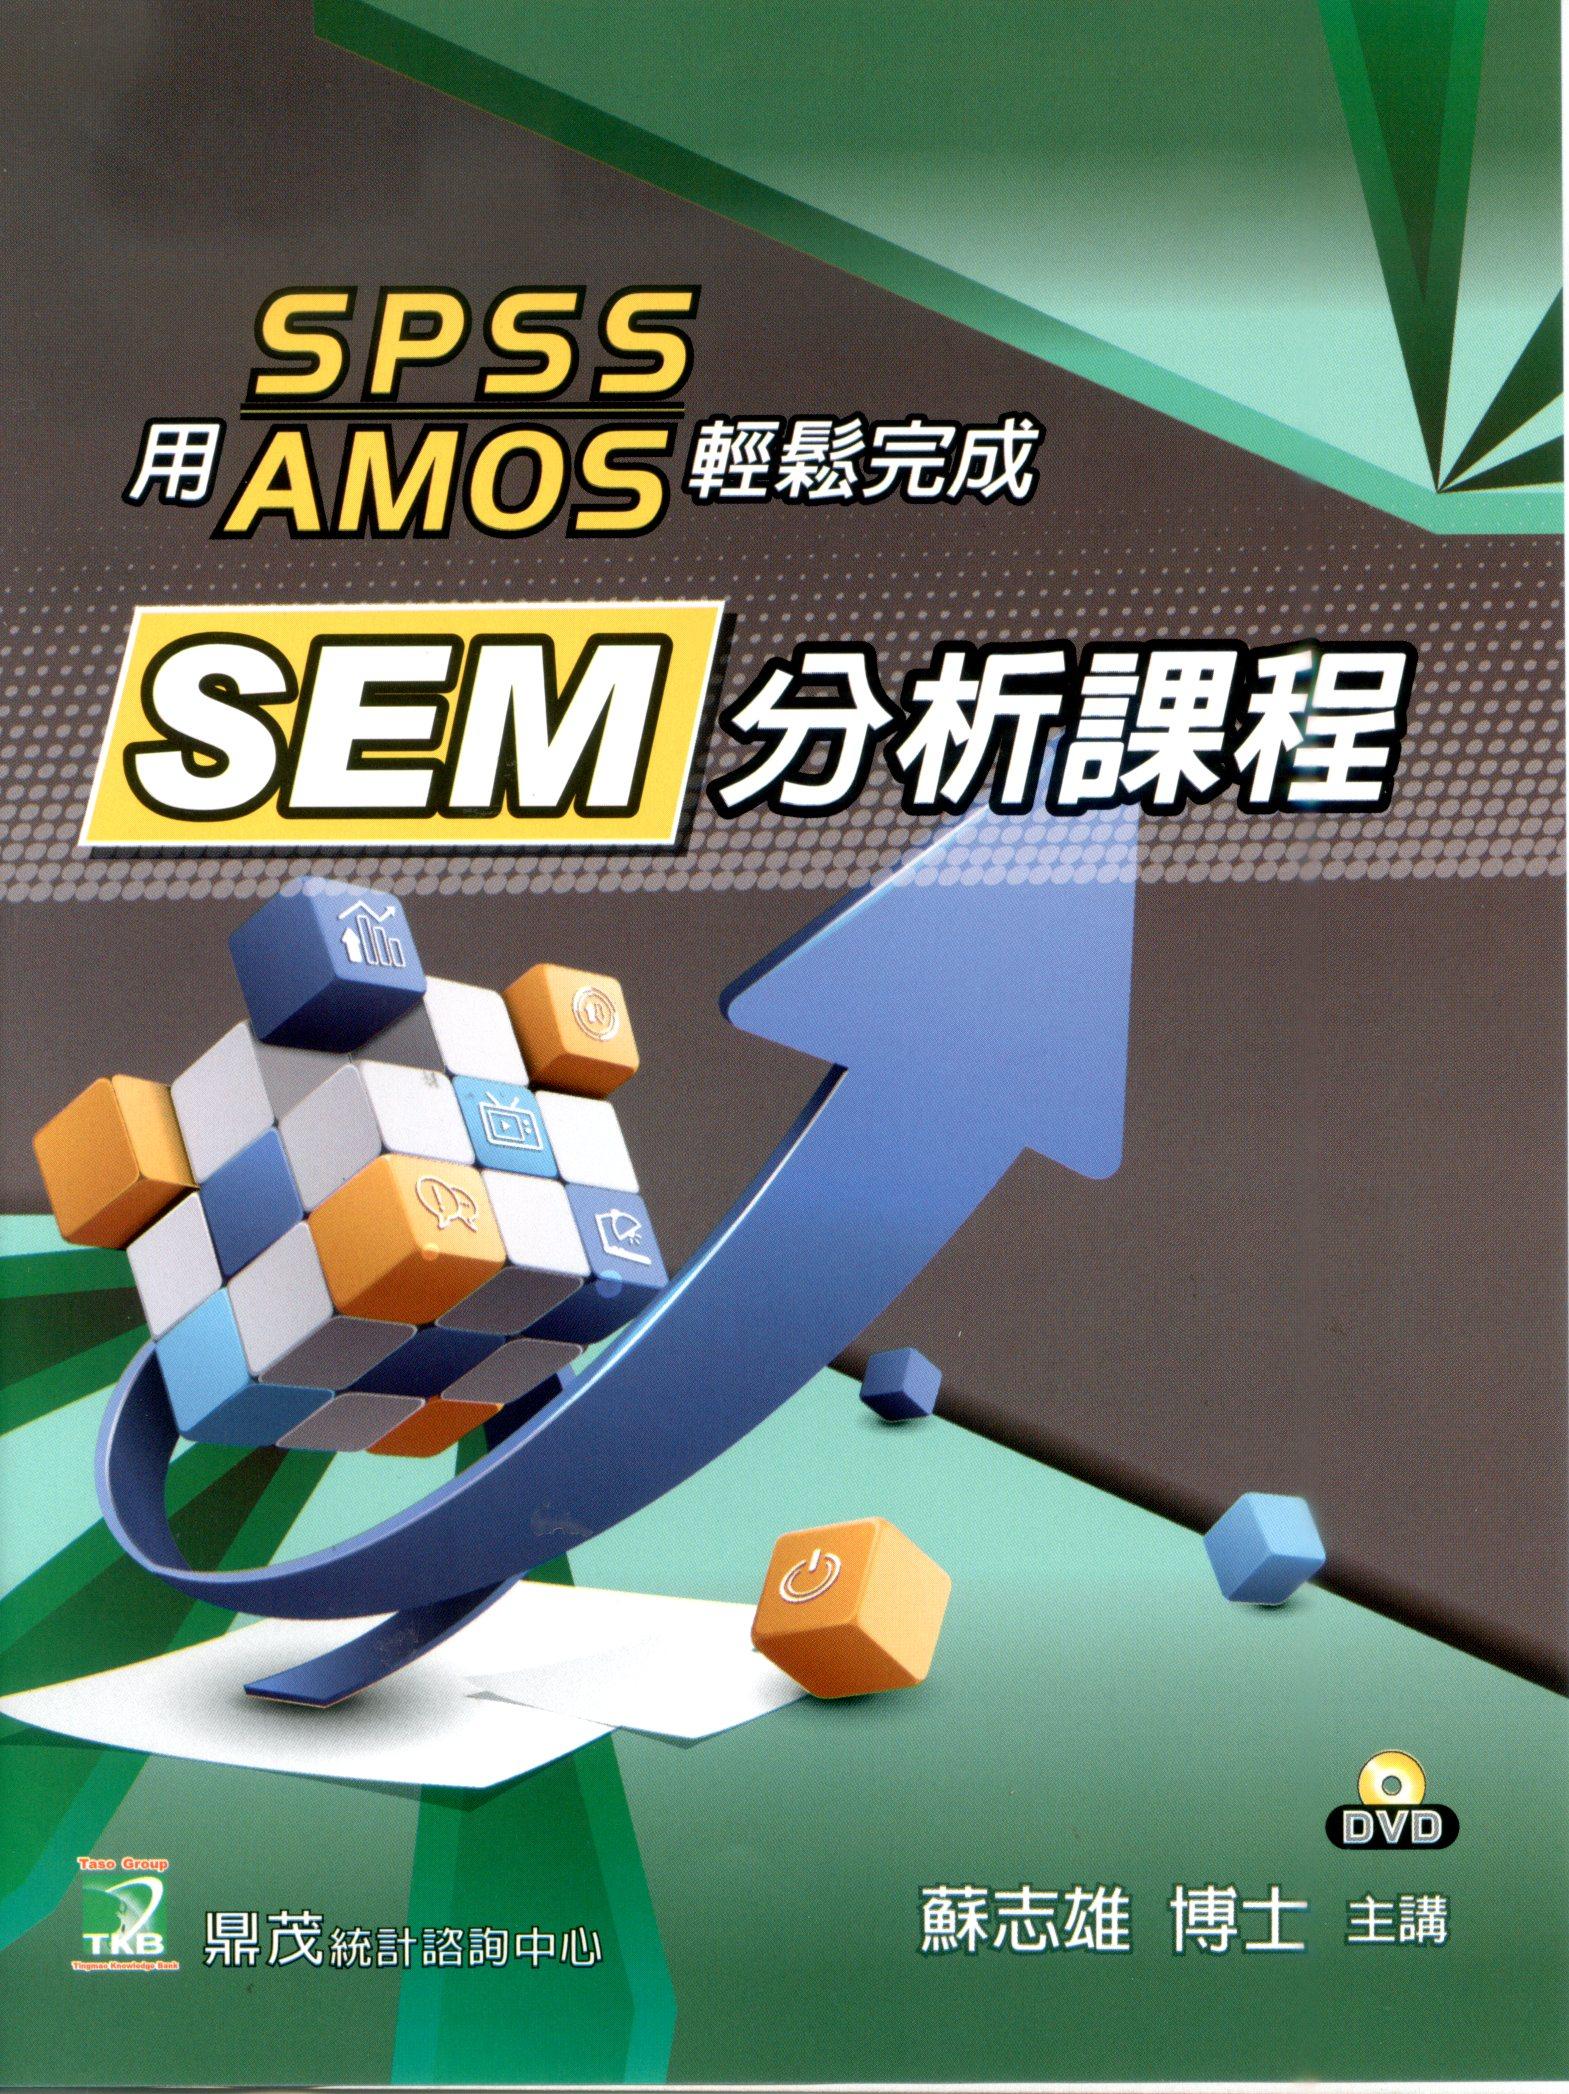 用SPSS AMOS輕鬆完成SEM分析課程